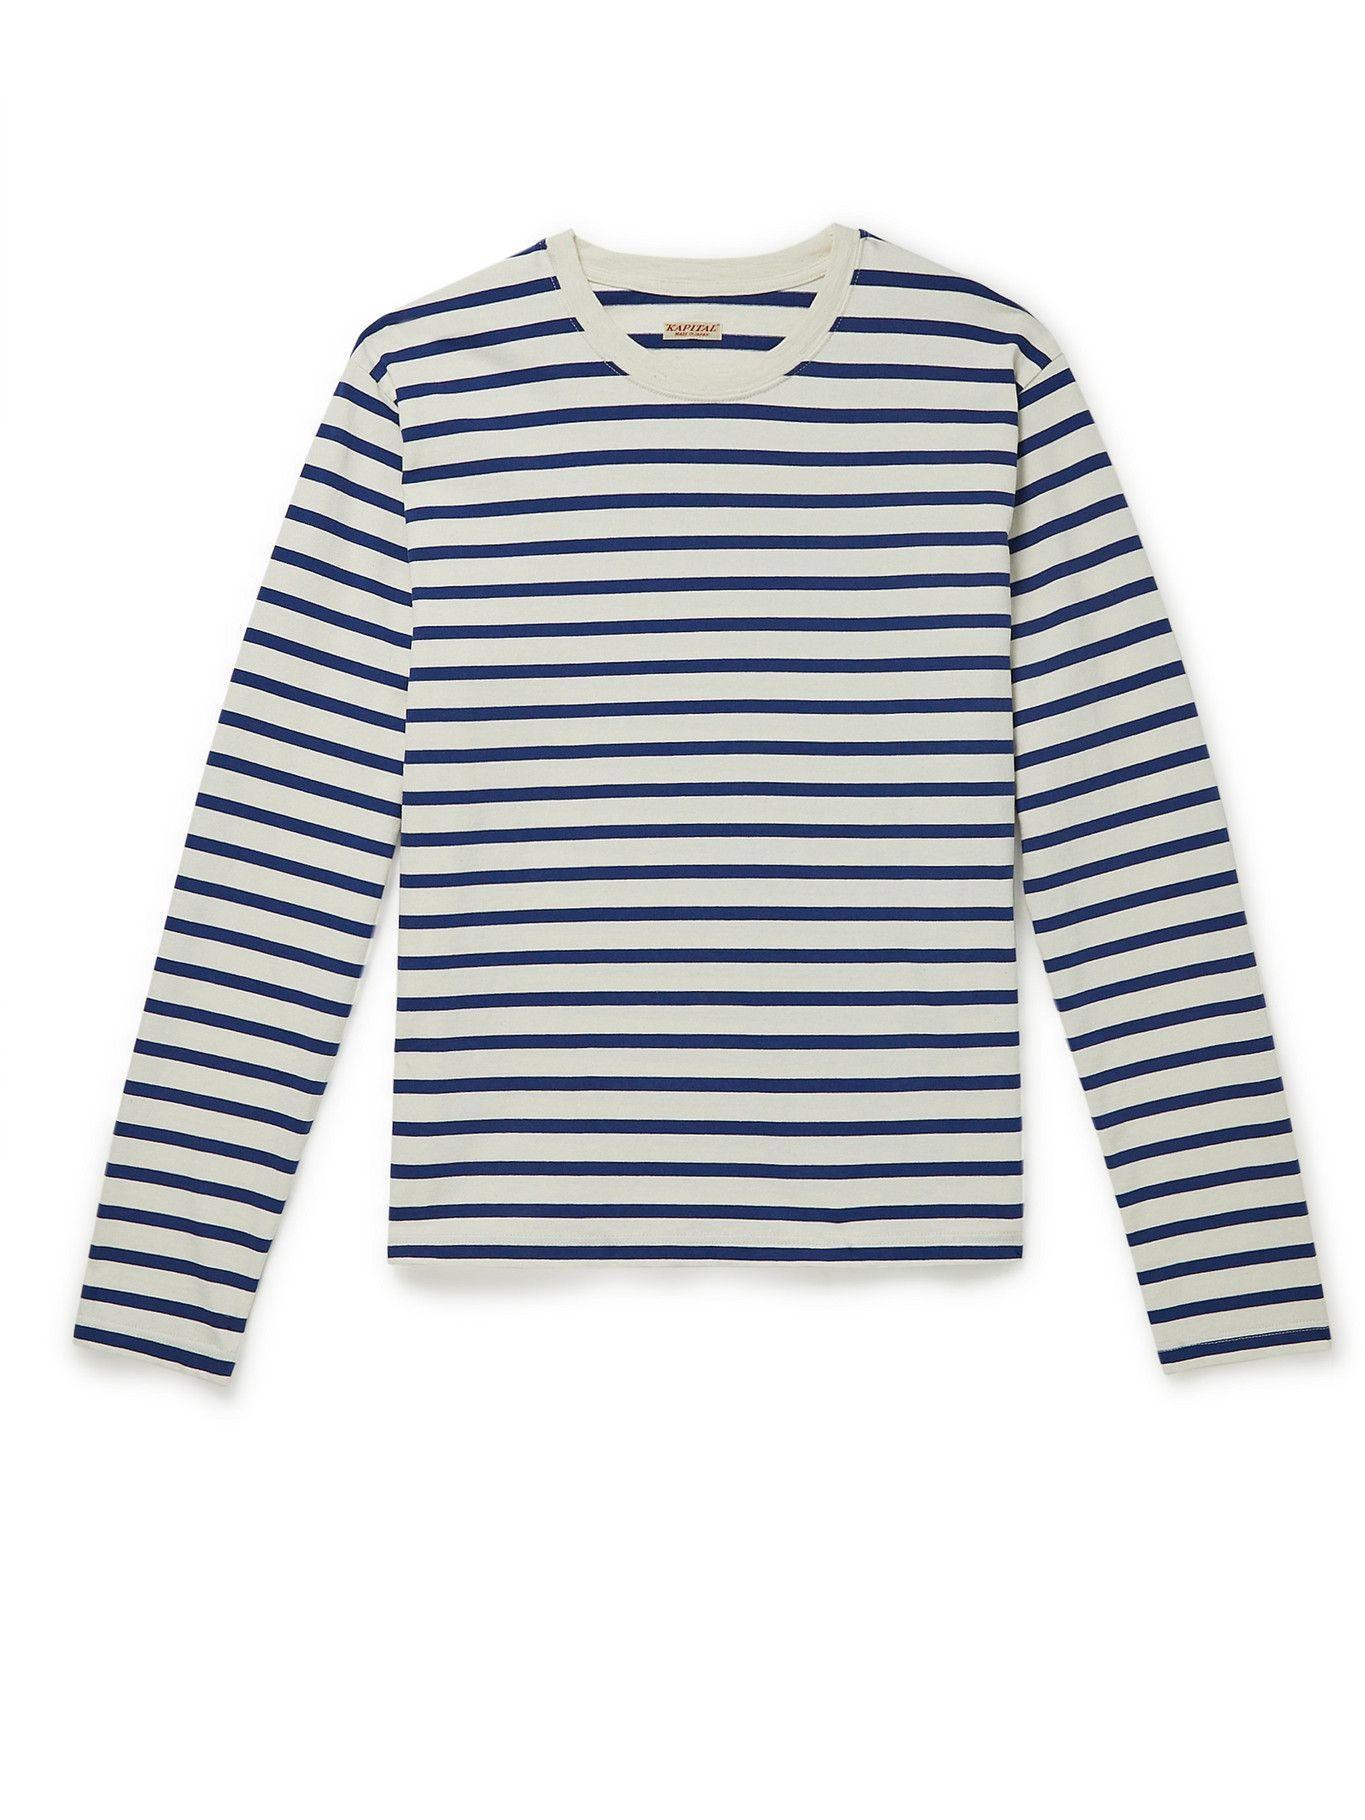 Photo: KAPITAL - Printed Striped Cotton-Jersey T-Shirt - Blue